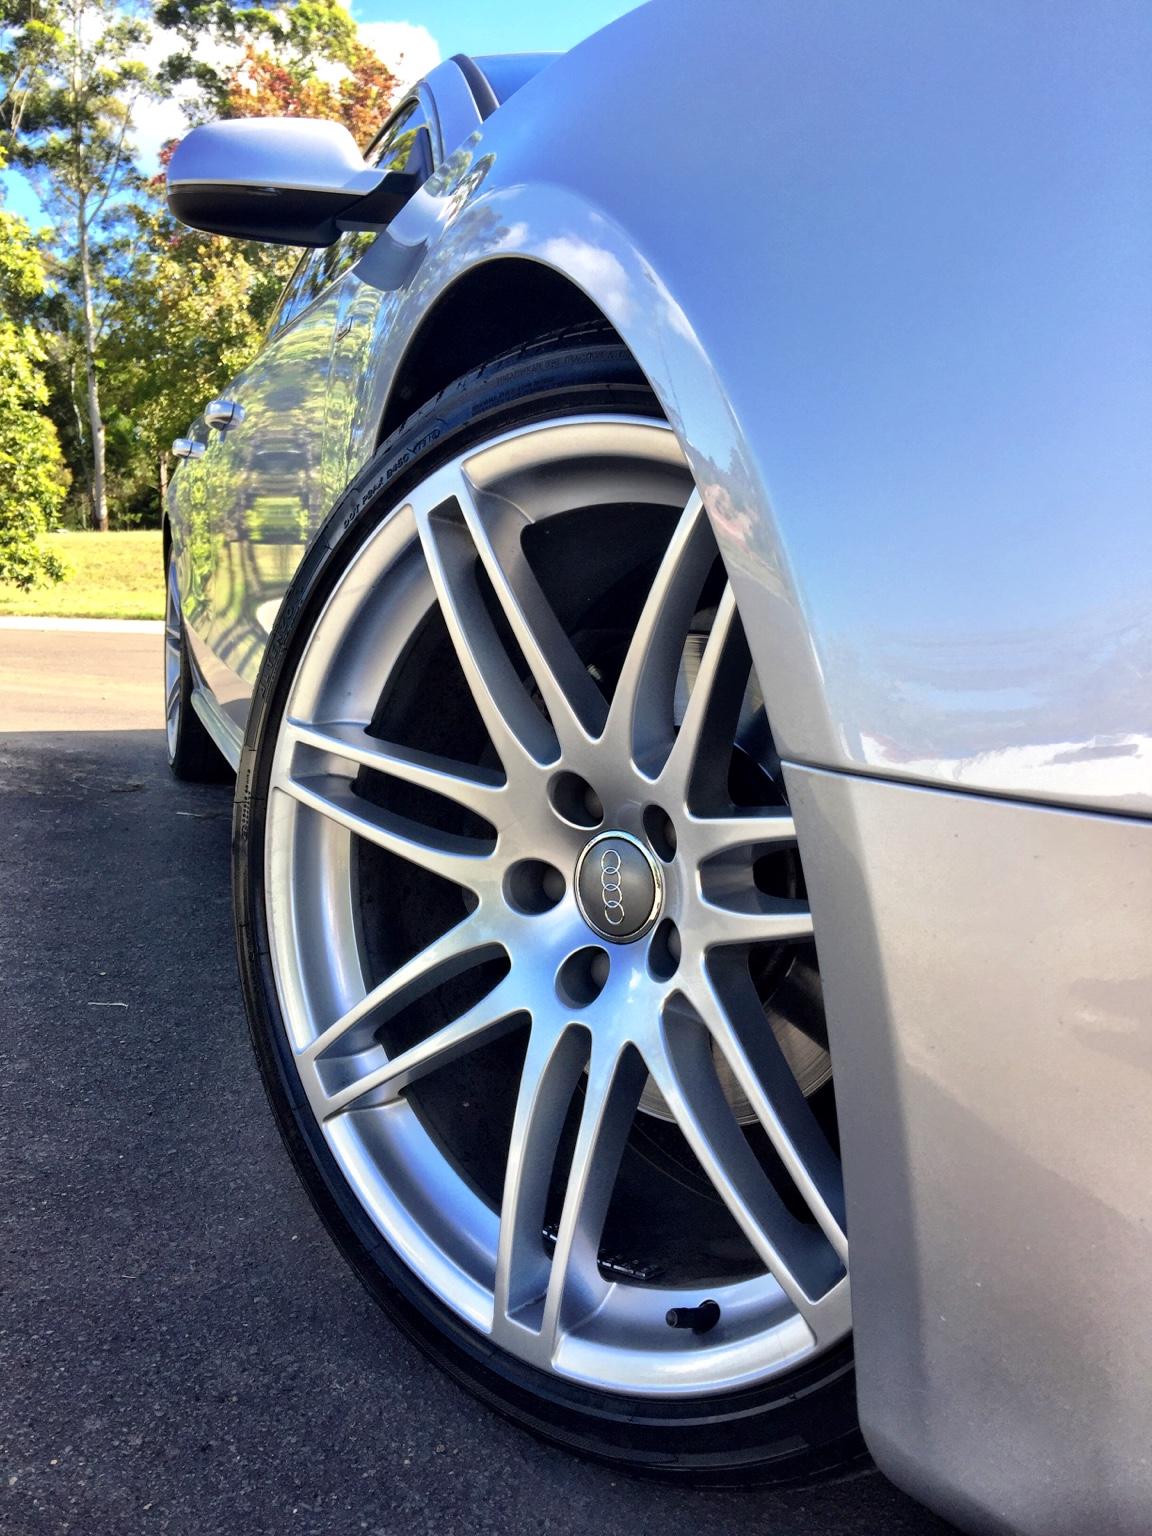 longer sold fourtitude vvmwyejh no genuine showthread com available wheels audi oem fs